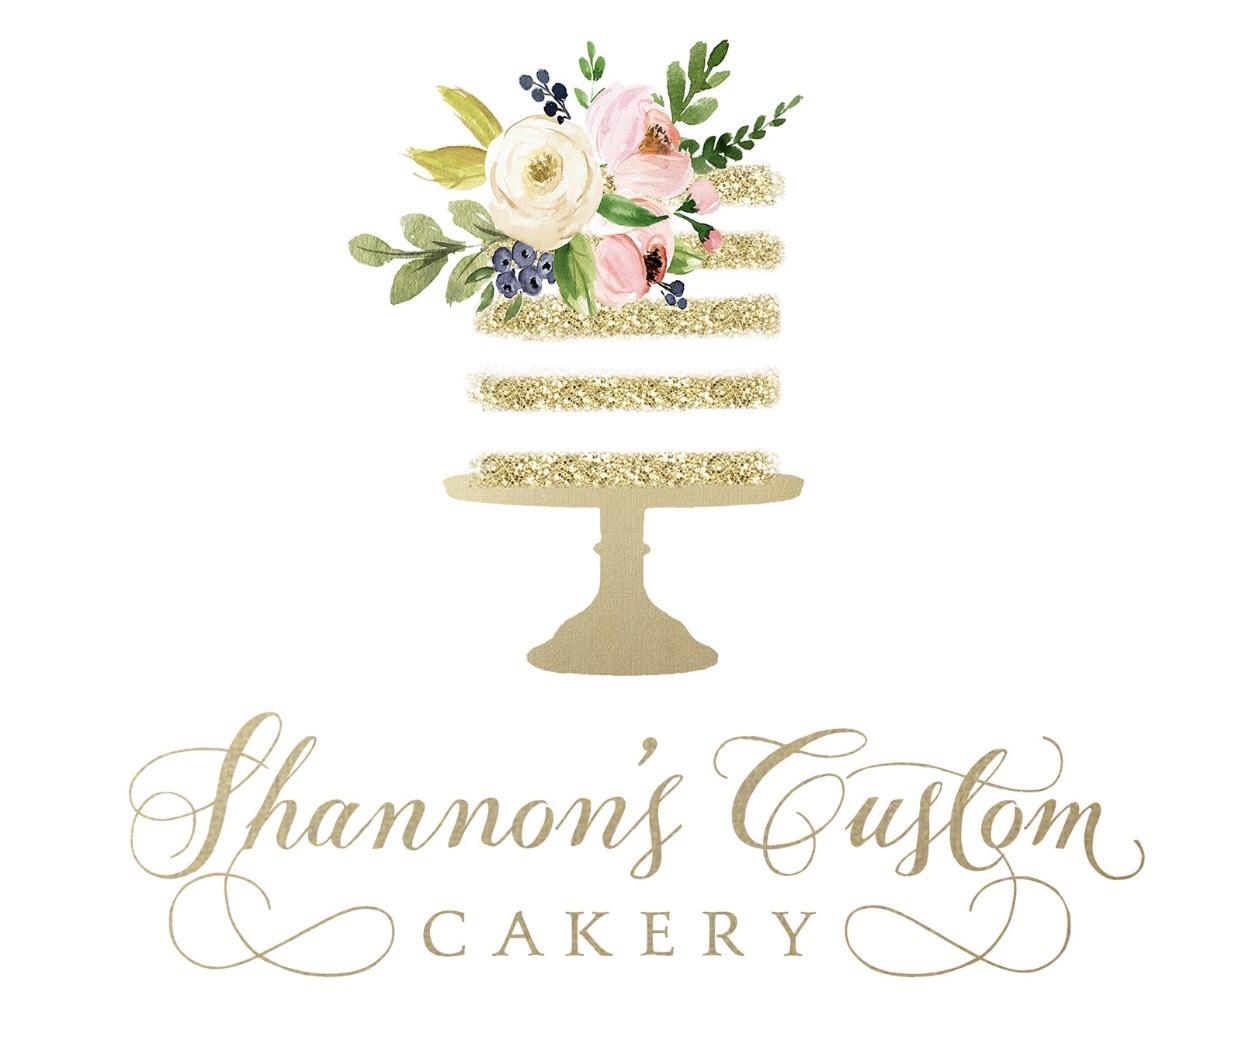 Shannon's Custom Cakery